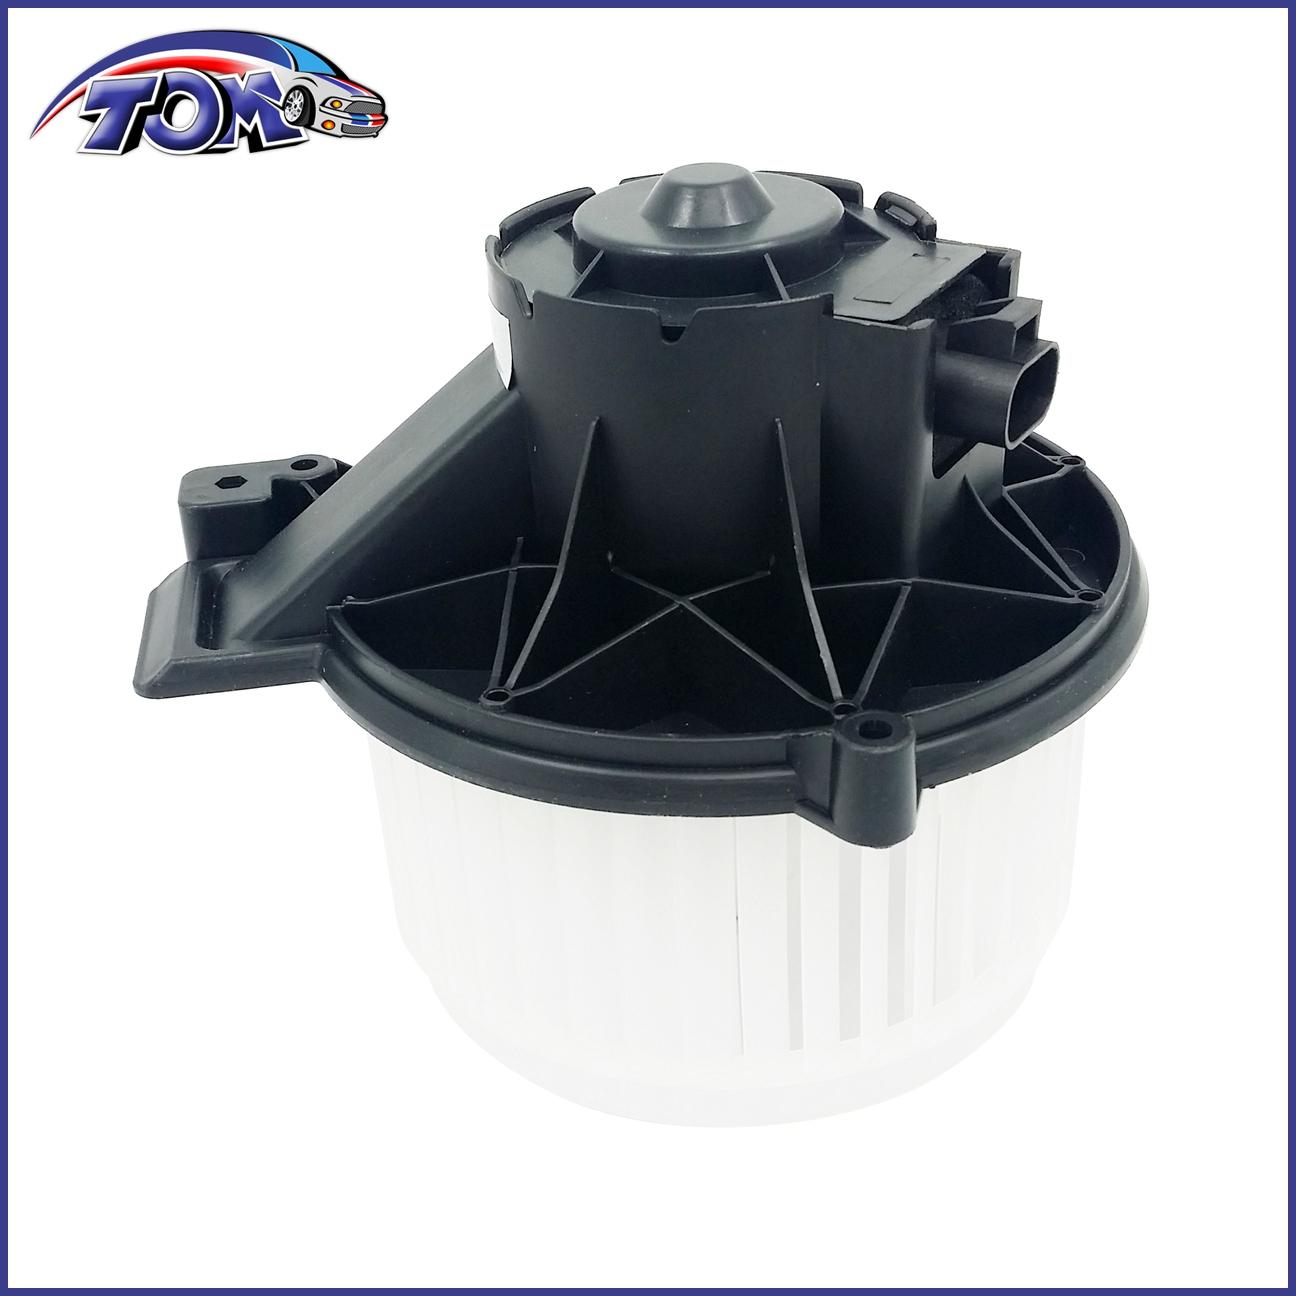 FDB020 700169 AC Heater Blower Motor for Ford Mercury Fusion Milan